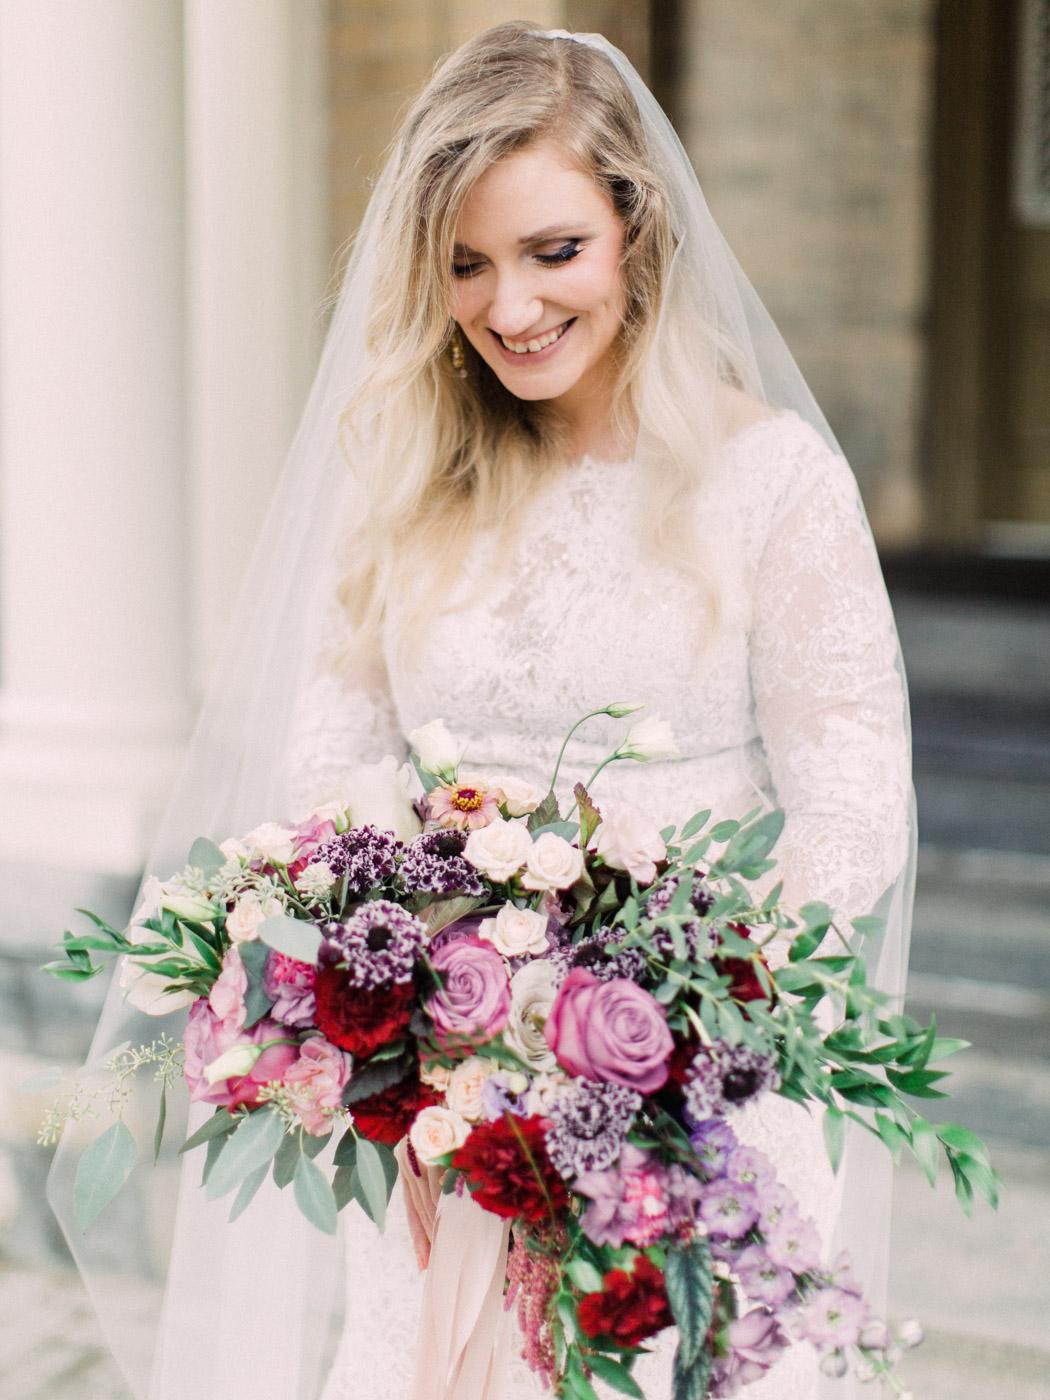 Toronto-wedding-photographer-intimate-classic-fine-art-elopement-ottawa39.jpg